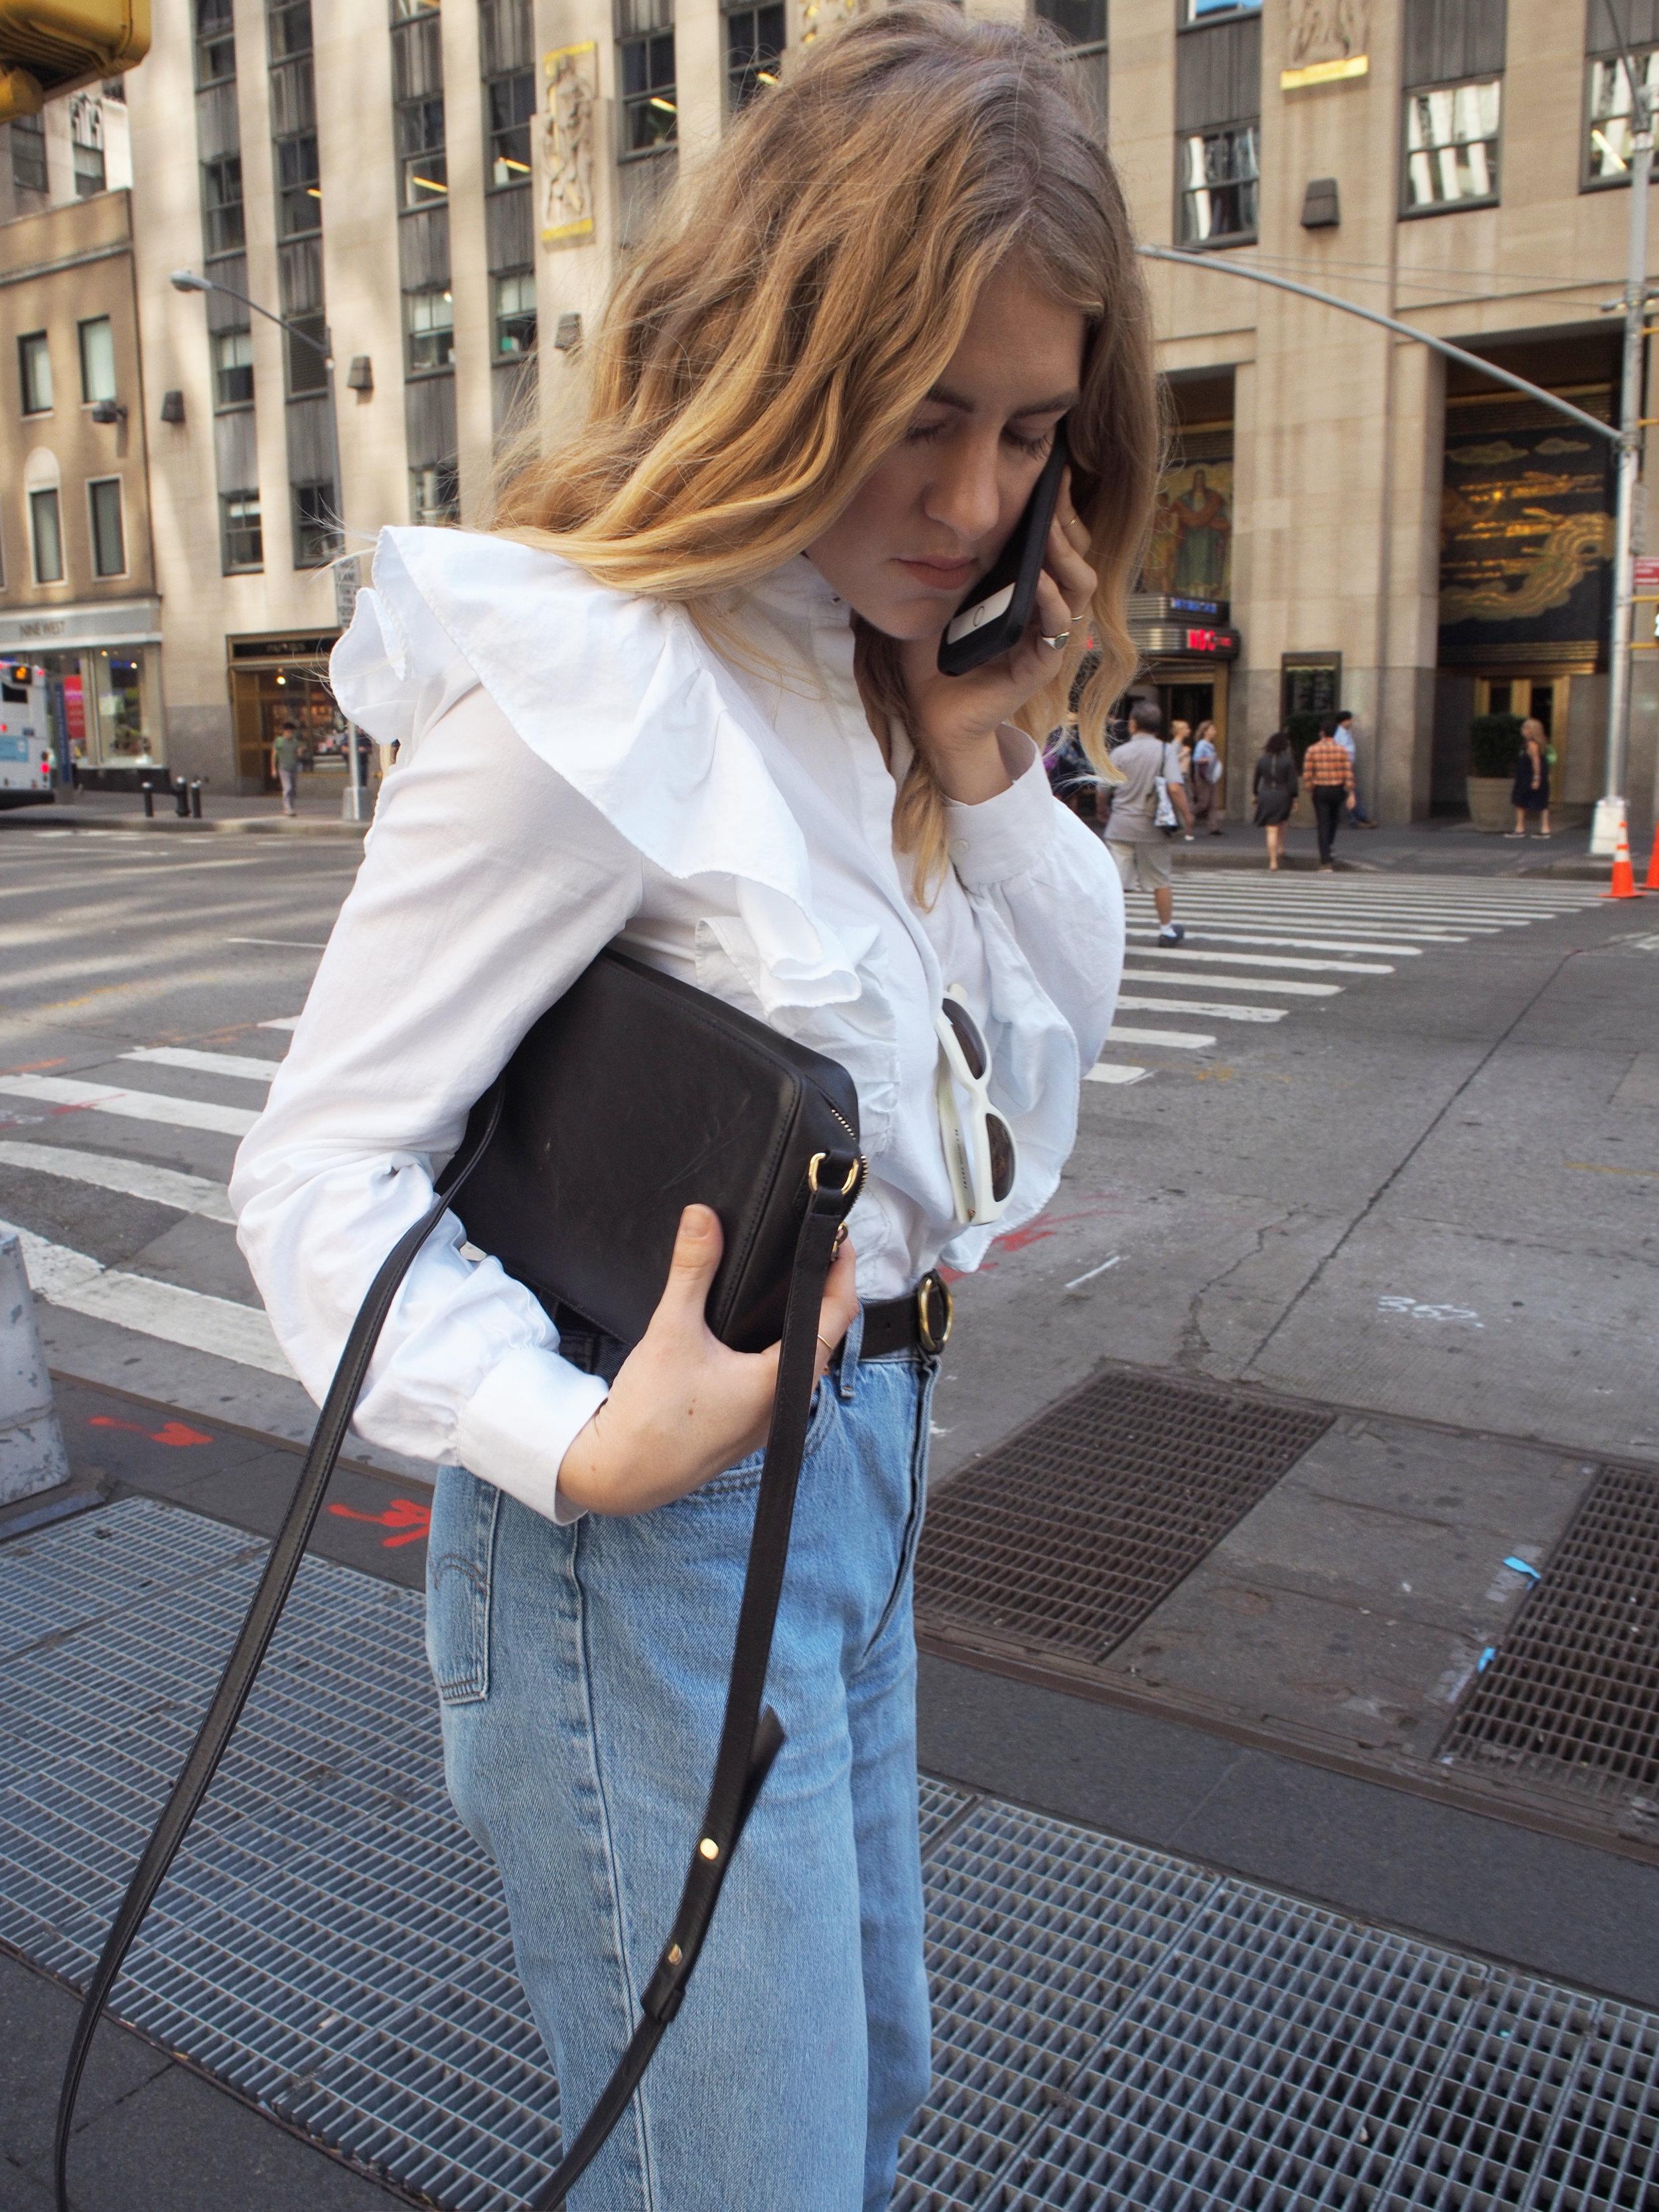 NYFW New York Fashion Week Day Three Recap OOTD H&M Ruffled Top Levis Acne Studios Reem Acra R&Co. Backstage Taylr Anne www.taylranne.com